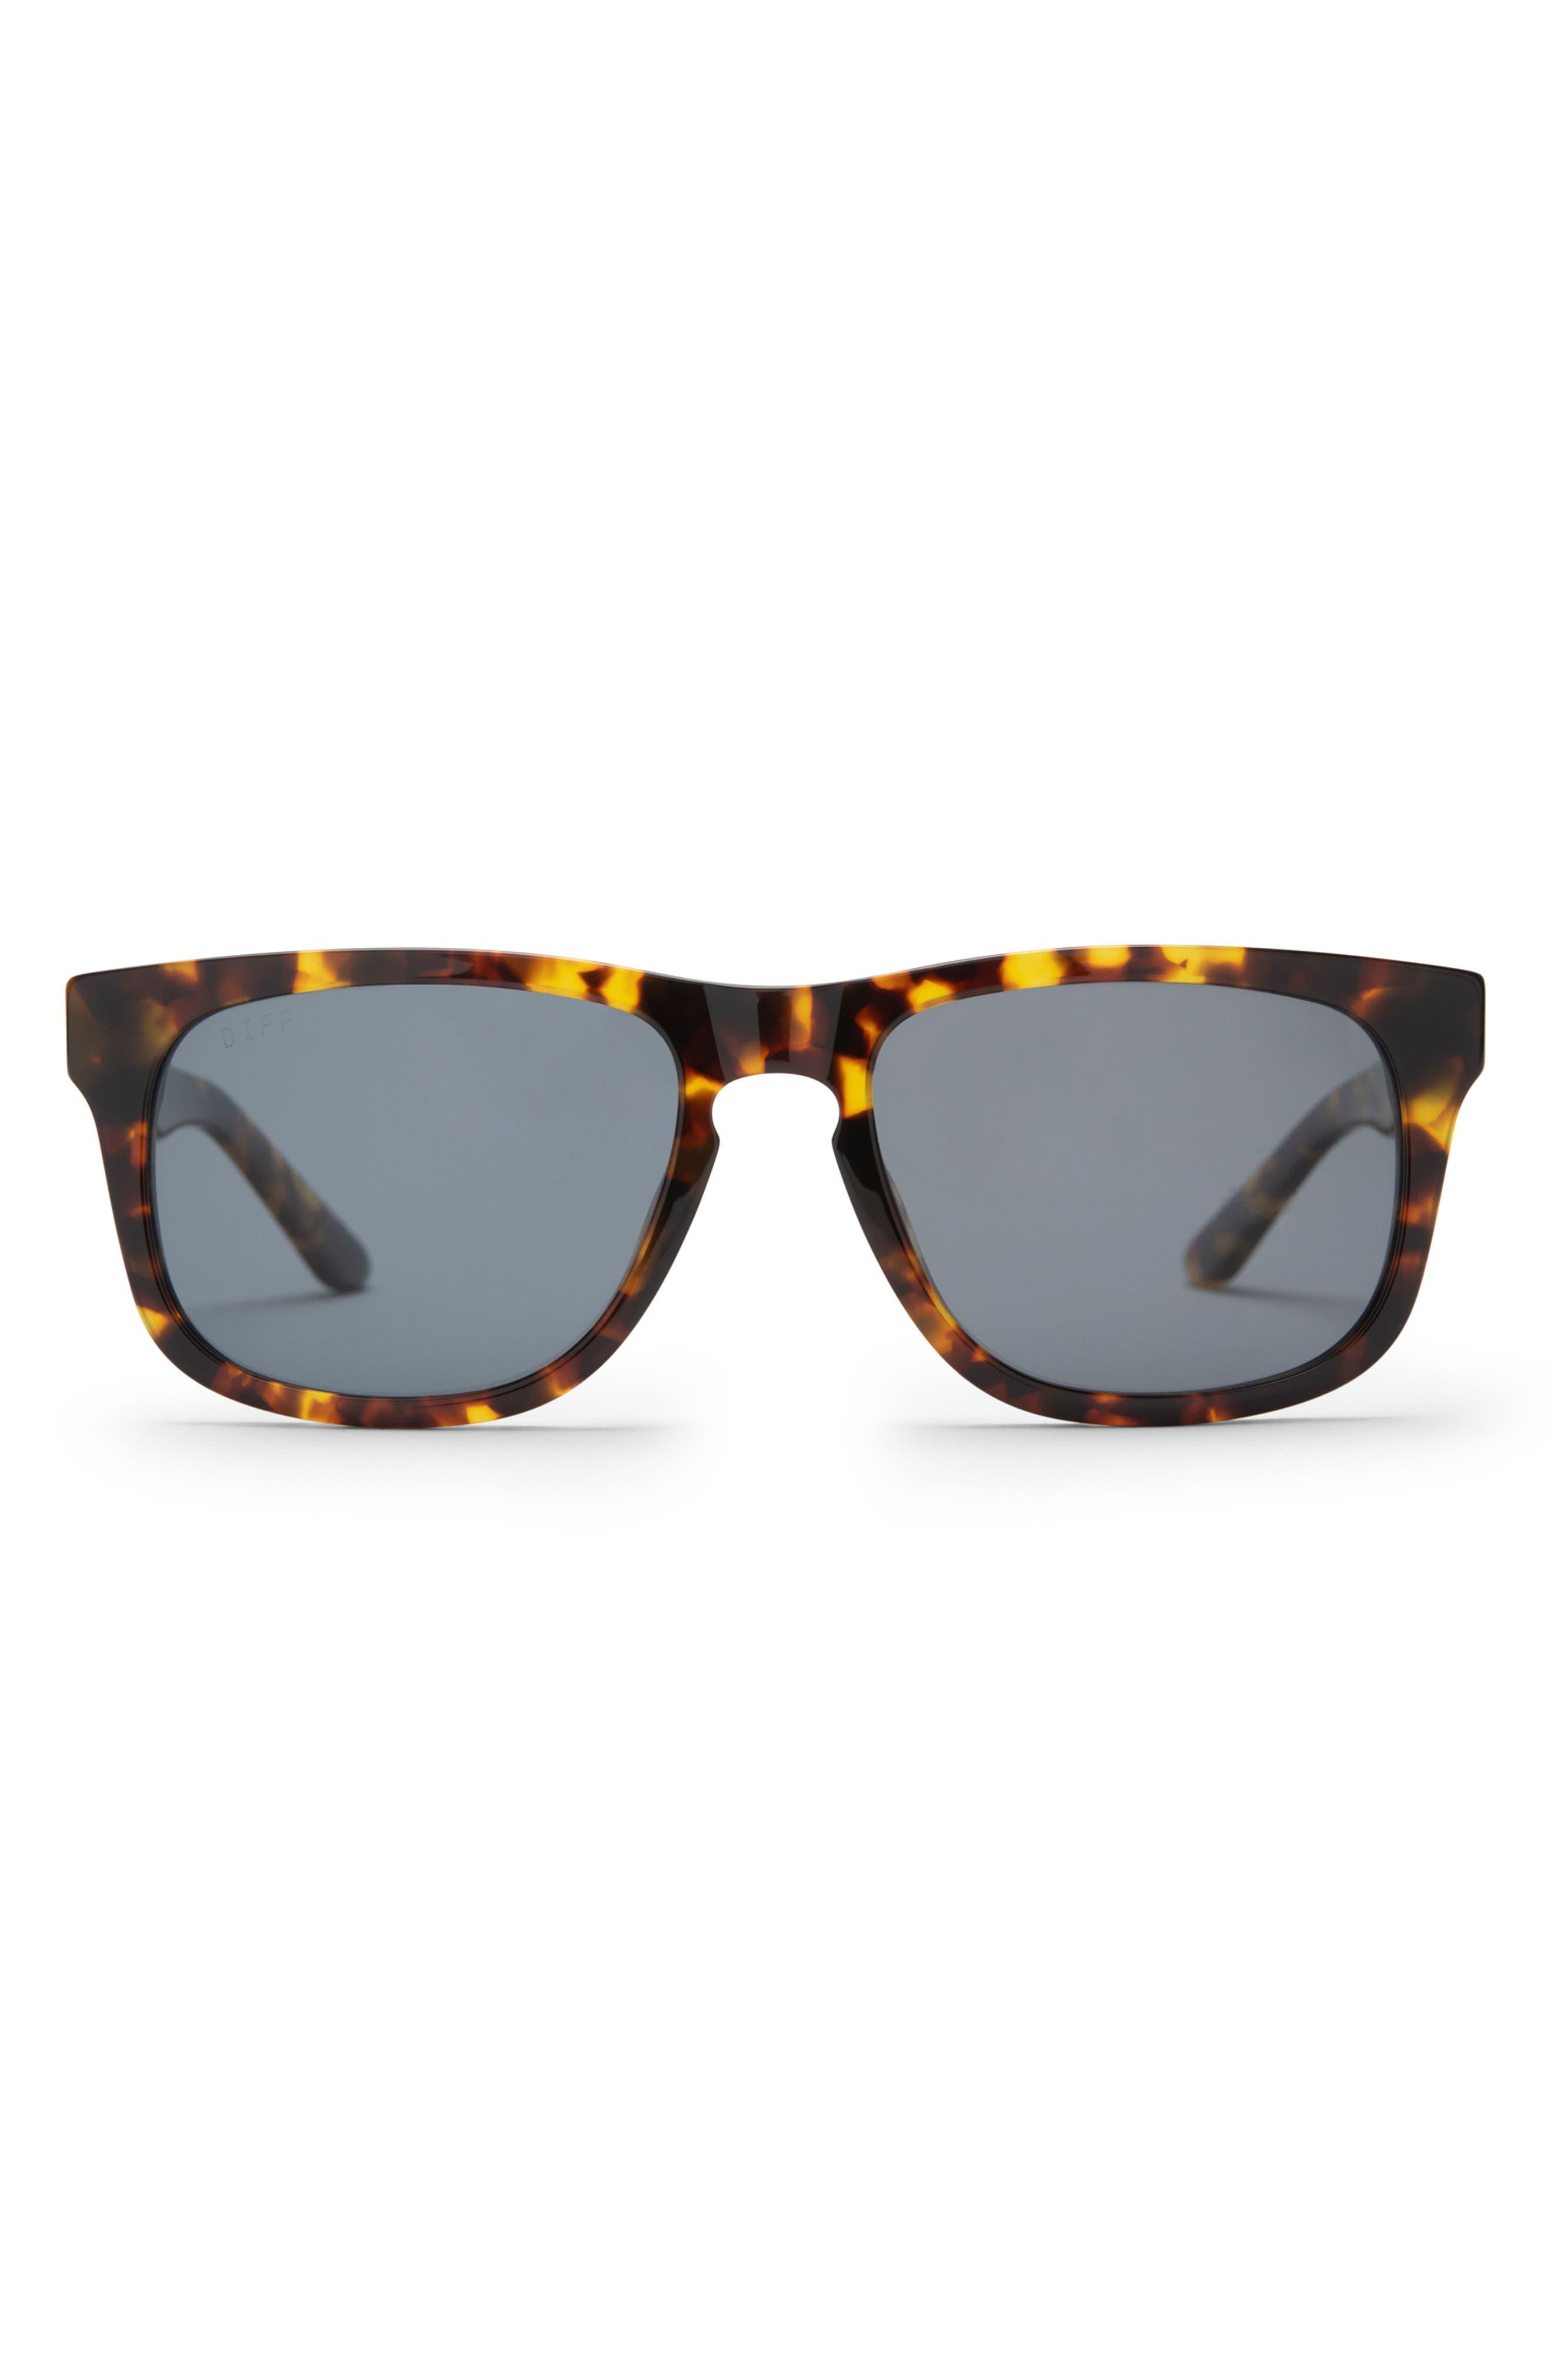 Riley 55mm Polarized Rectangle Sunglasses